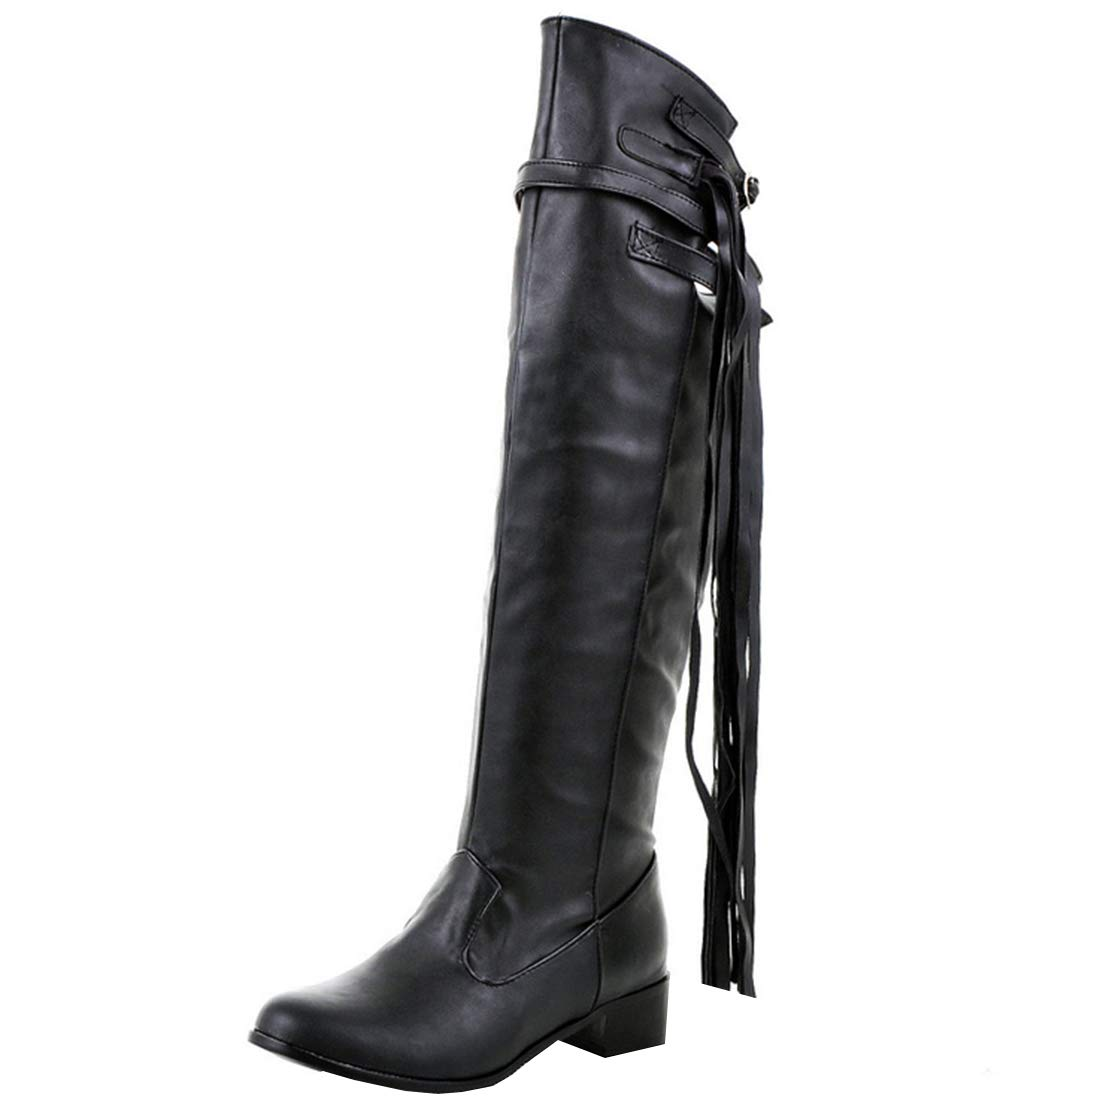 db03f3bb2427b Amazon.com: Artfaerie Womens Flat Over The Knee Boots Fringe Western ...